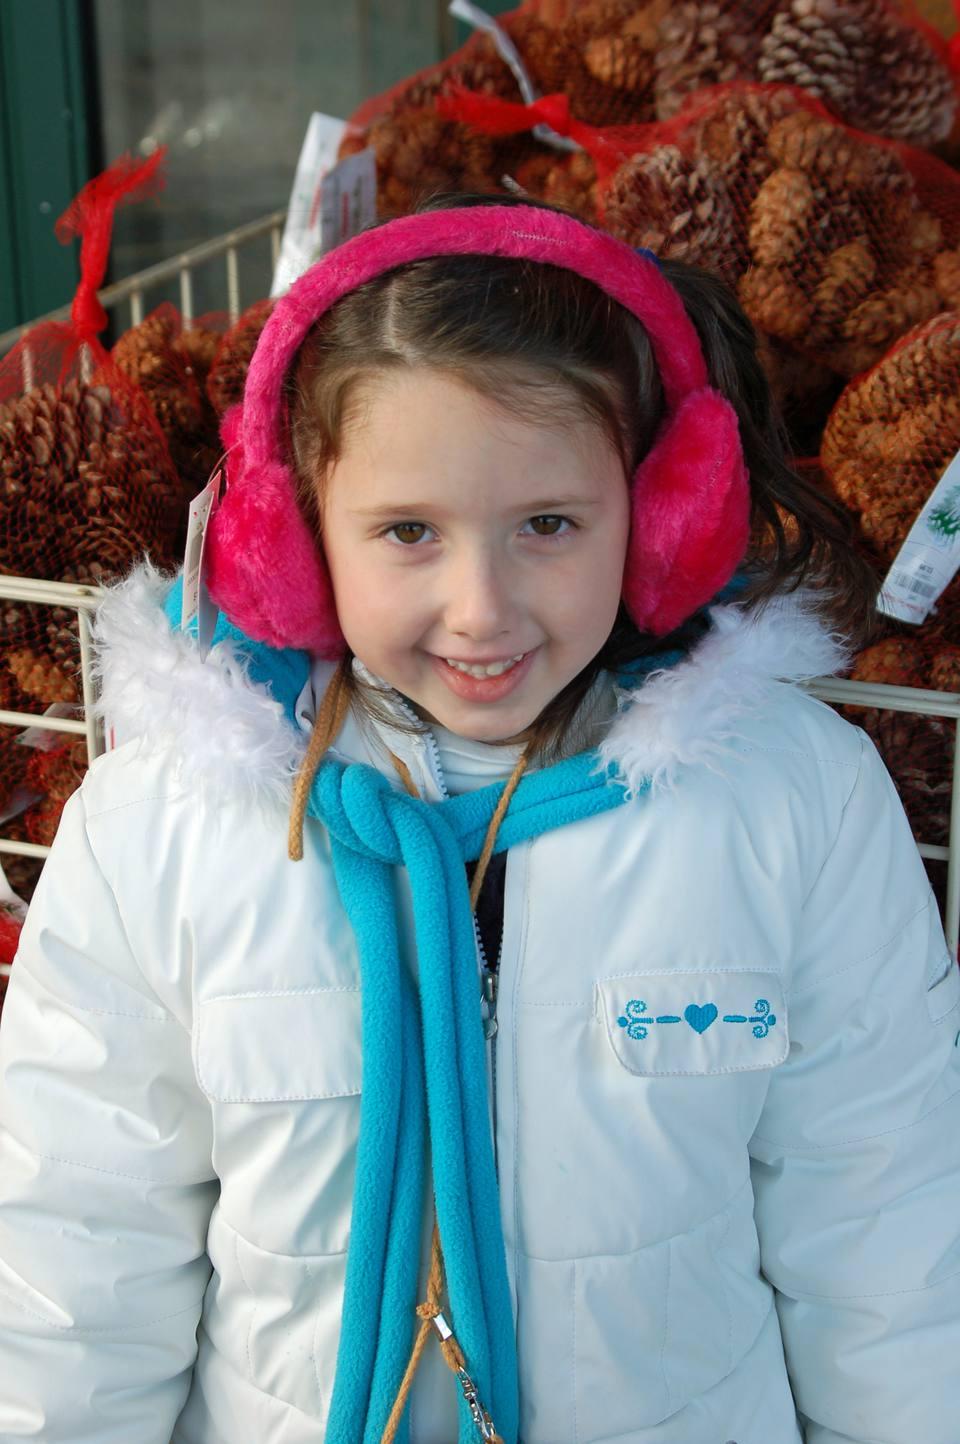 shopping at christmas tree shops - Christmas Tree Shop Pembroke